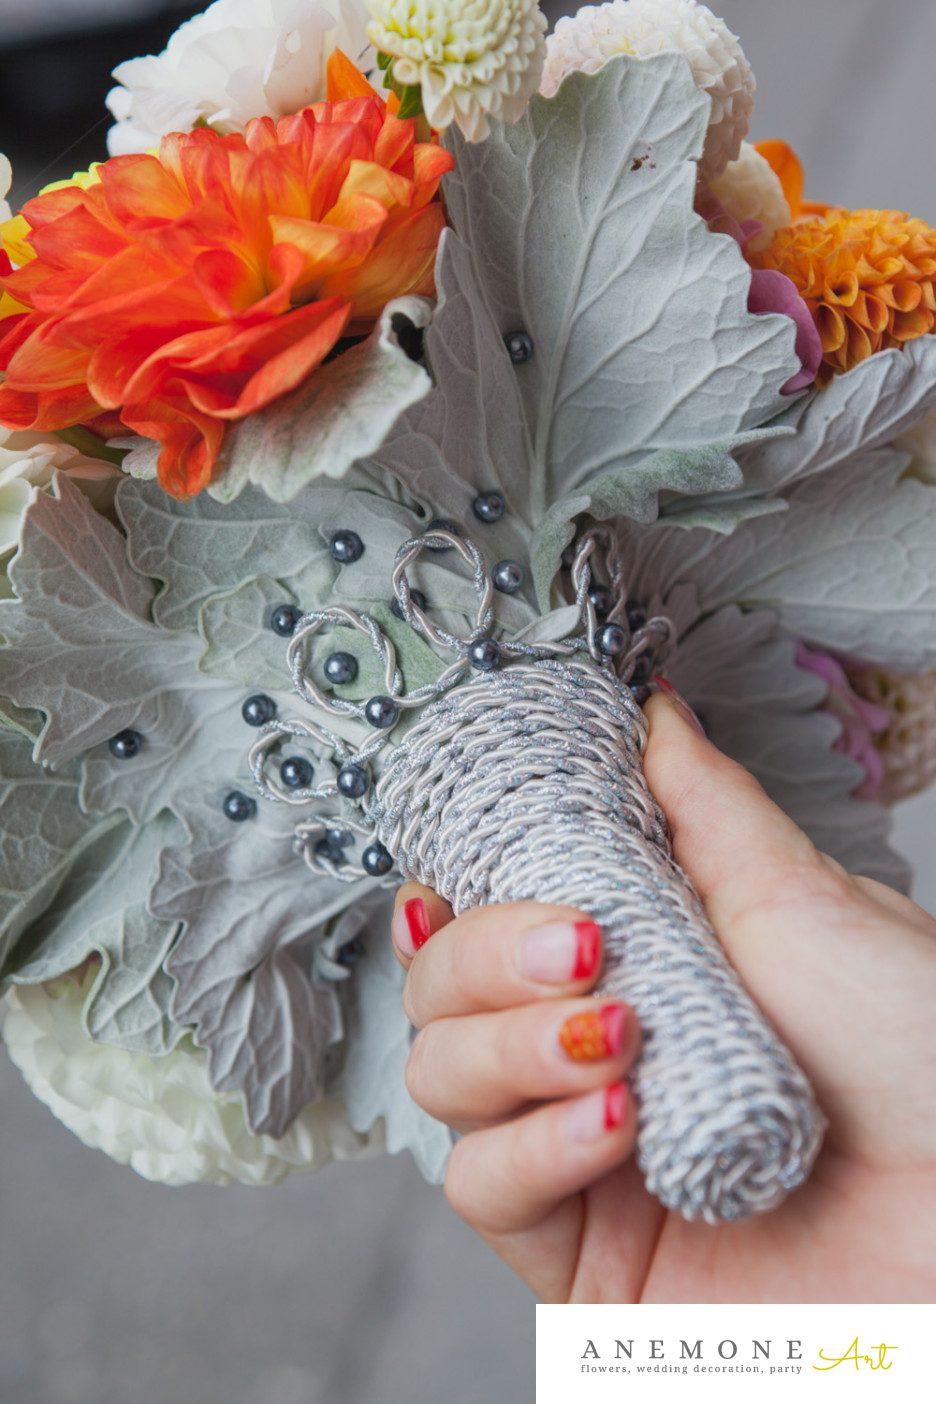 Poza, foto cu Flori de nunta buchet mireasa, dalia, maner buchet, orhidee, portocaliu in Arad, Timisoara, Oradea (wedding flowers, bouquets) nunta Arad, Timisoara, Oradea